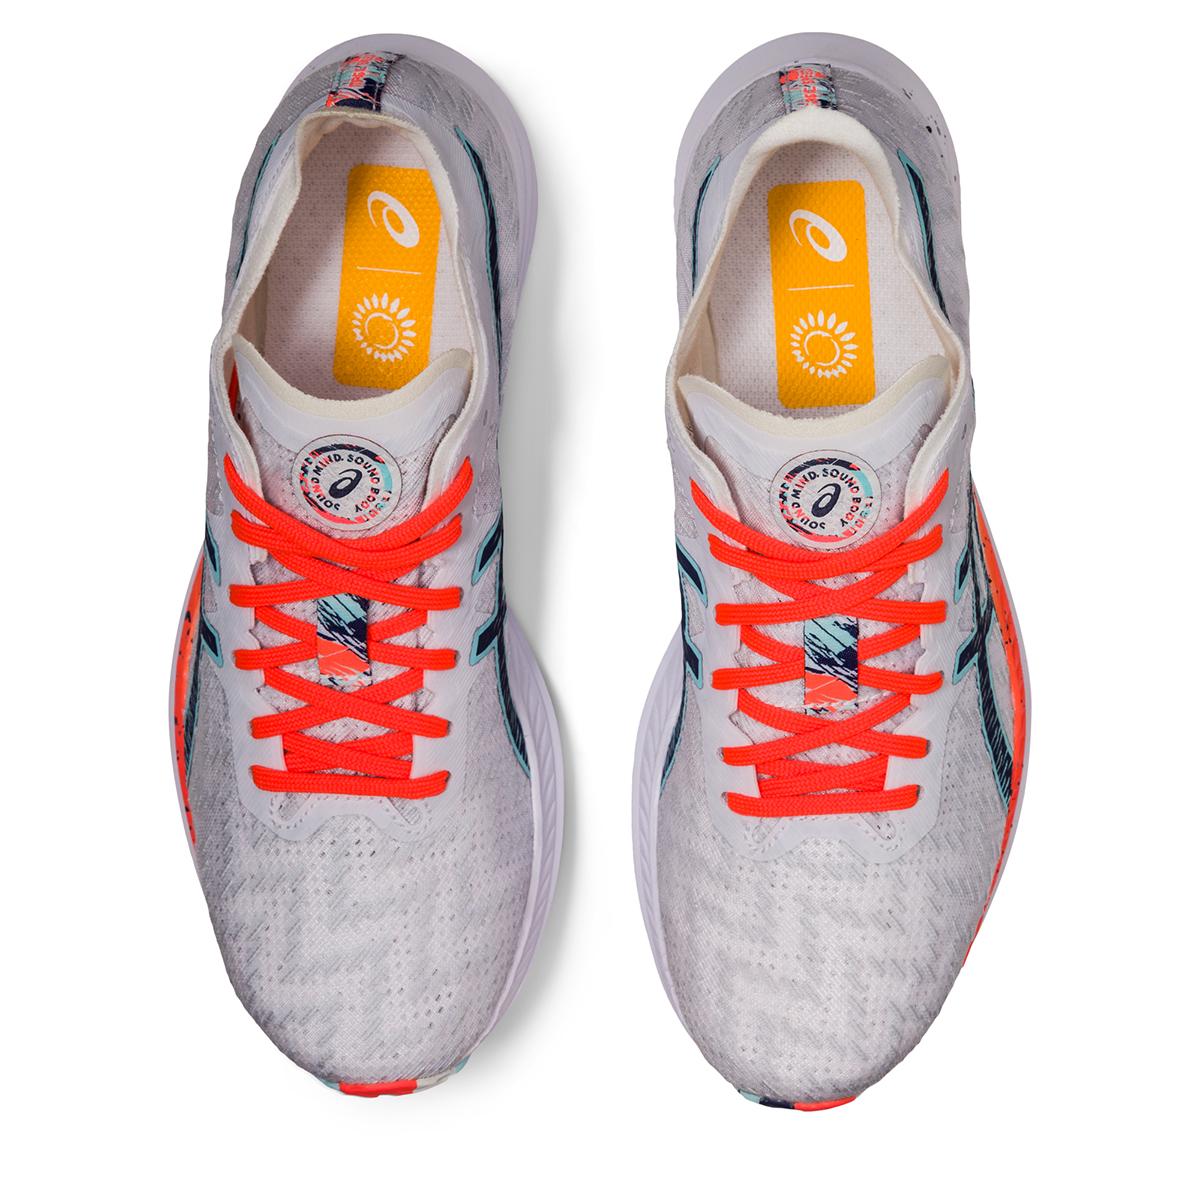 Women's Asics Magic Speed Running Shoe - Color: White/Thunder Blue - Size: 5 - Width: Regular, White/Thunder Blue, large, image 3